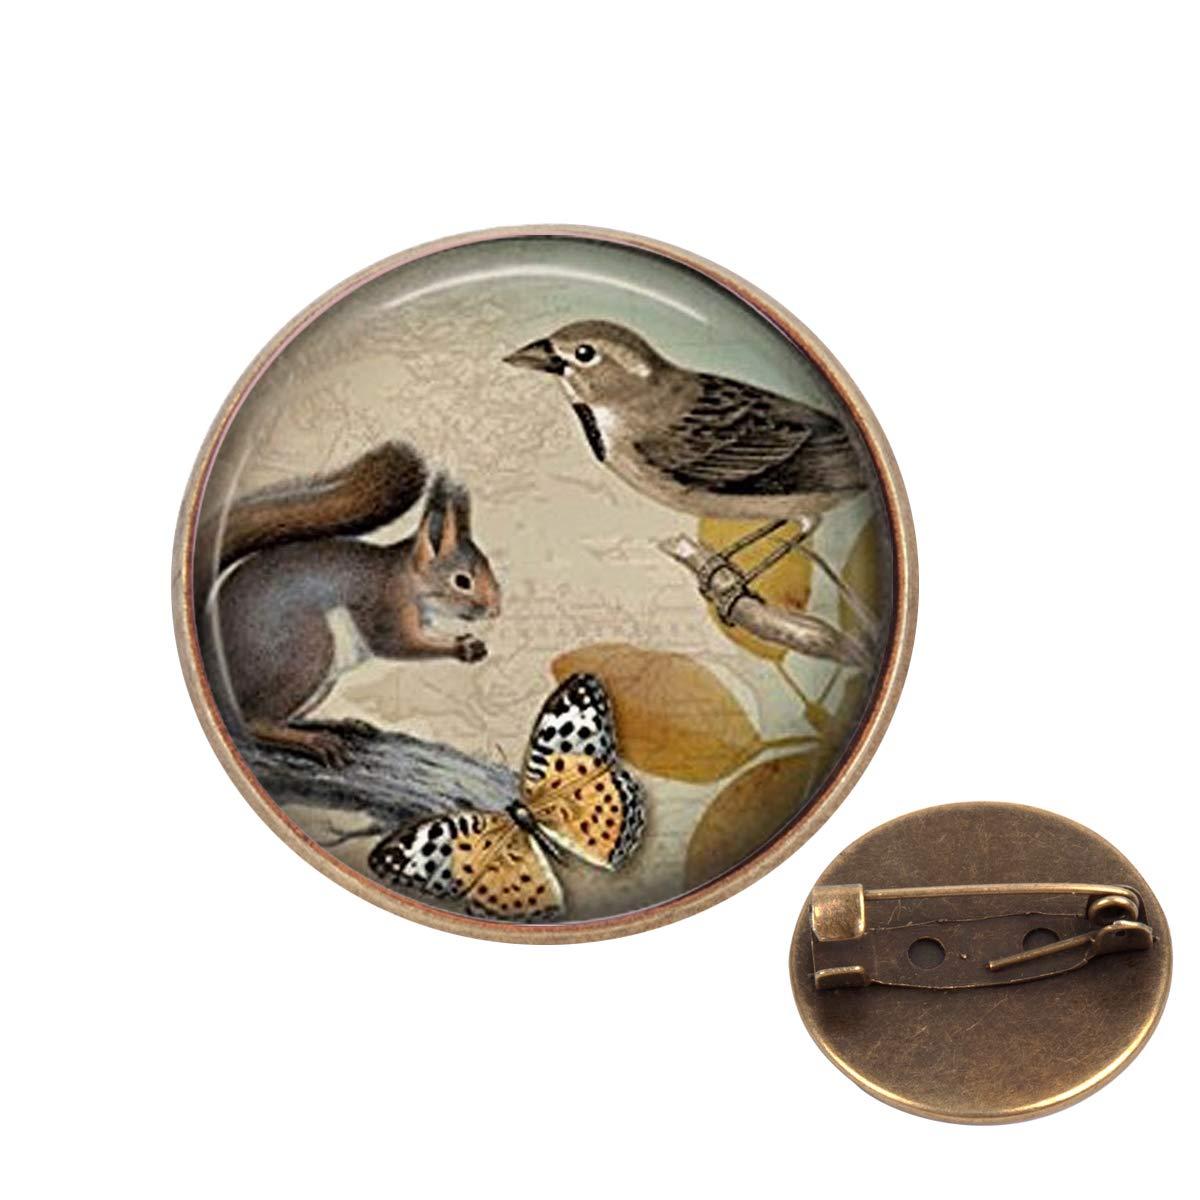 Pinback Buttons Badges Pins Squirrel Art Animal Lapel Pin Brooch Clip Trendy Accessory Jacket T-Shirt Bag Hat Shoe